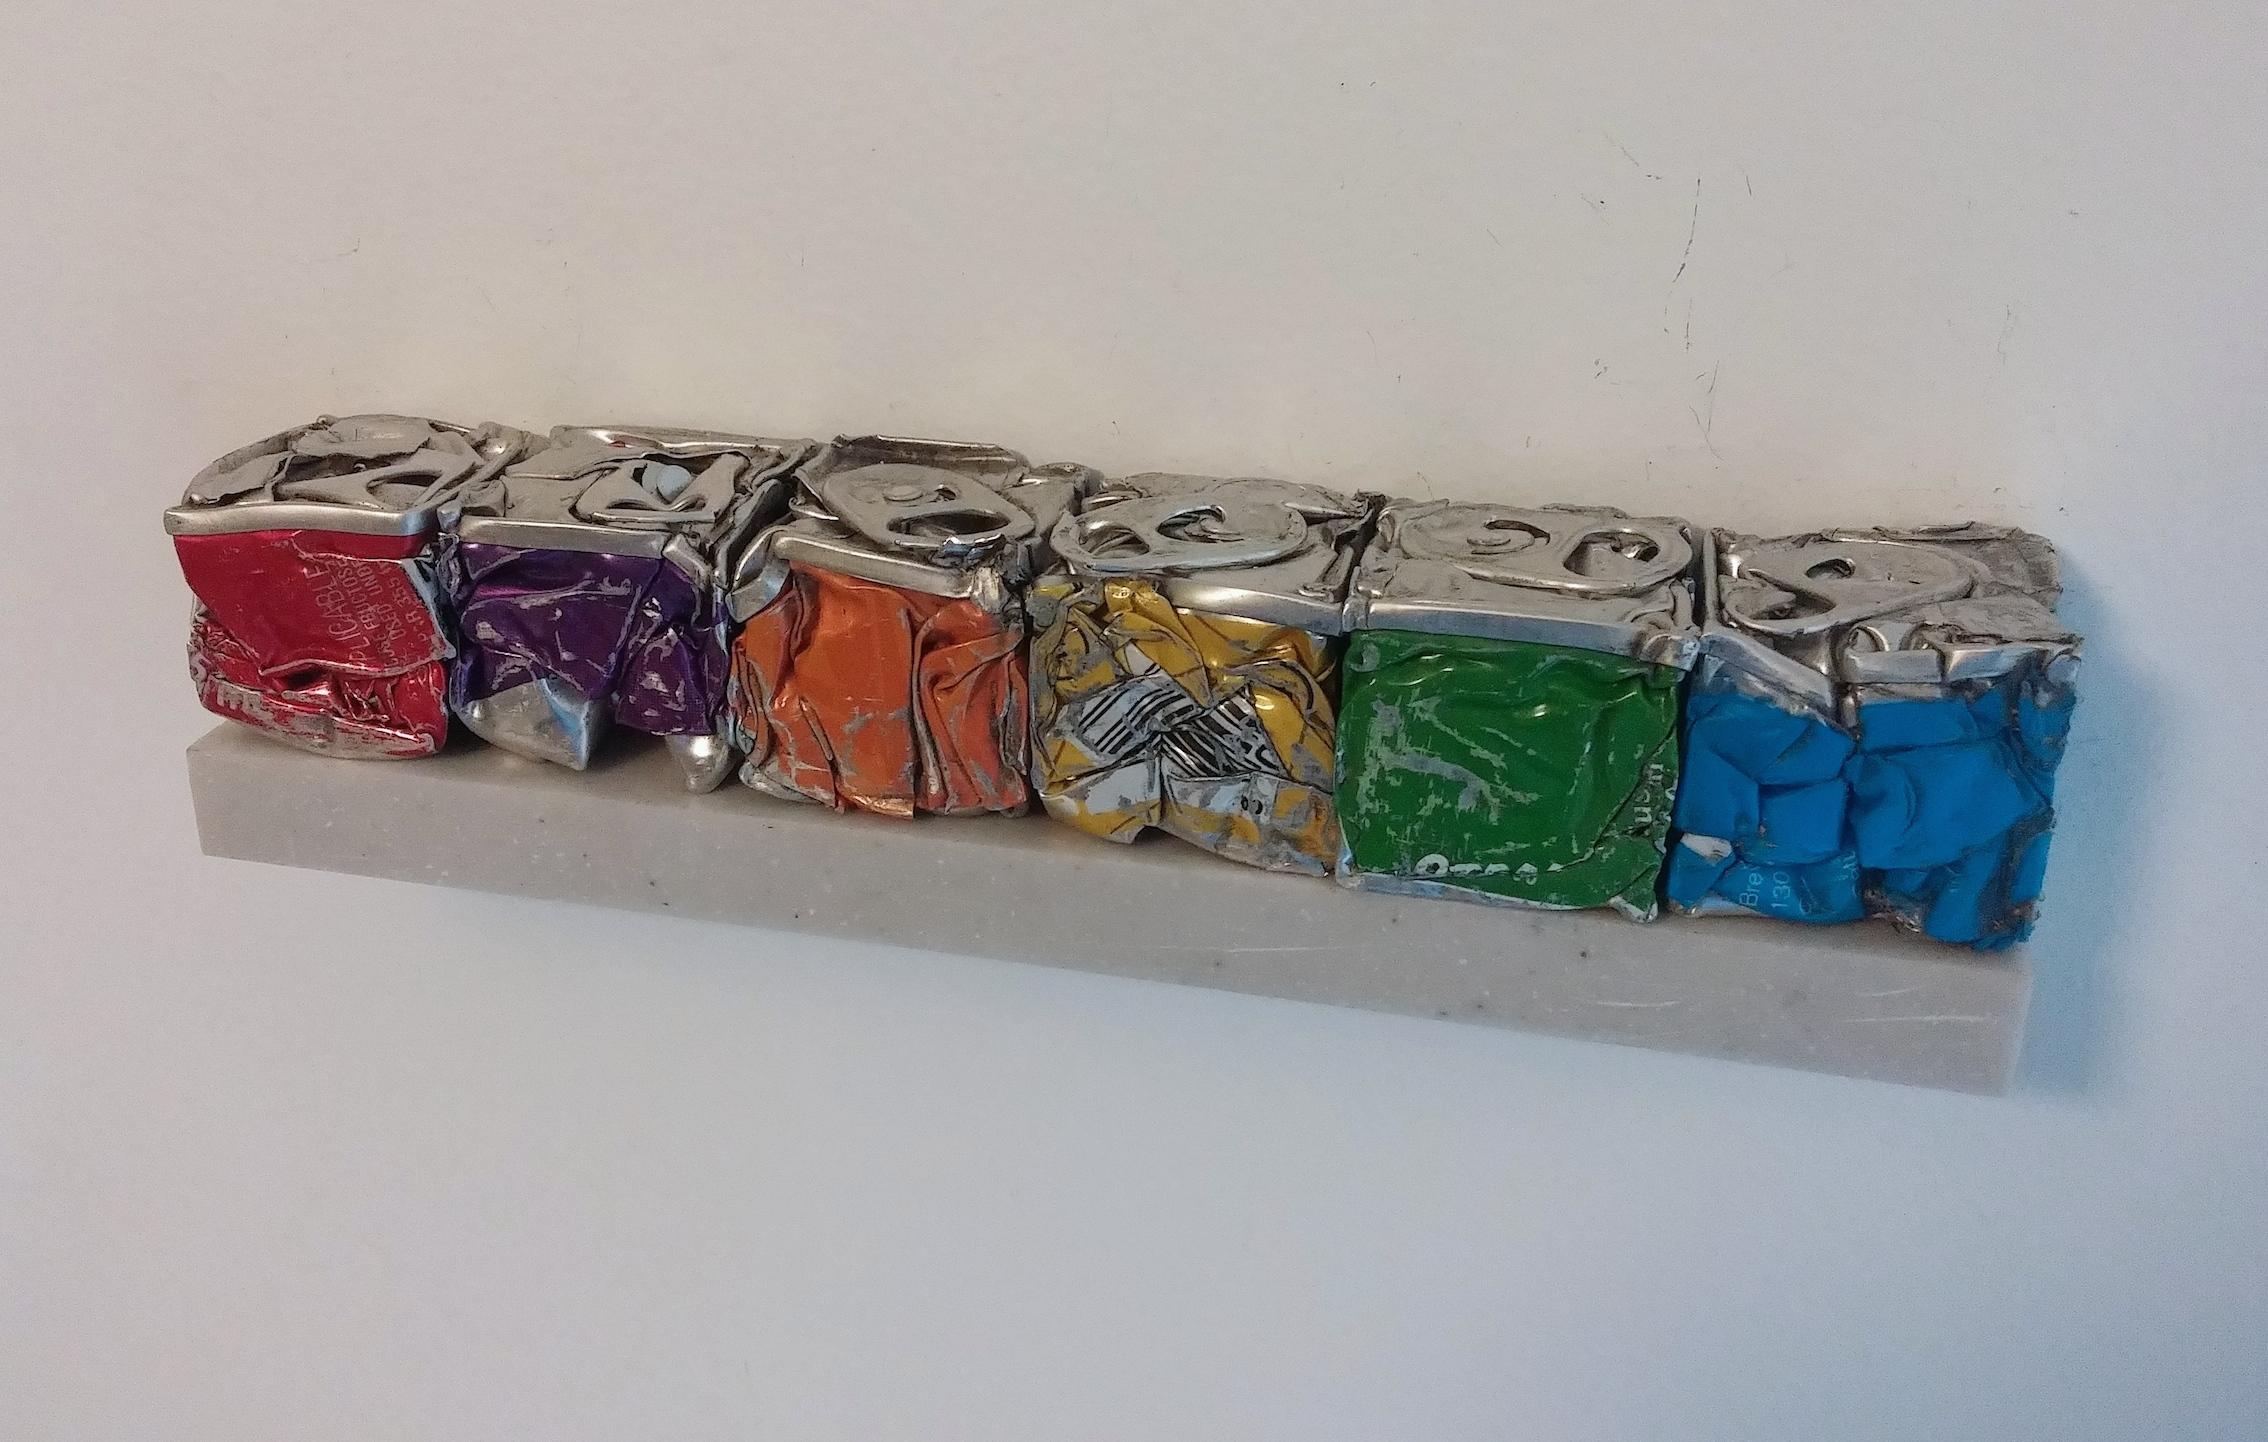 Robert Hengeveld,Itten Judd Study, Rainbow, 2016, Crushed aluminum cans, Varied open edition, 6 x 1 x 1 inches.